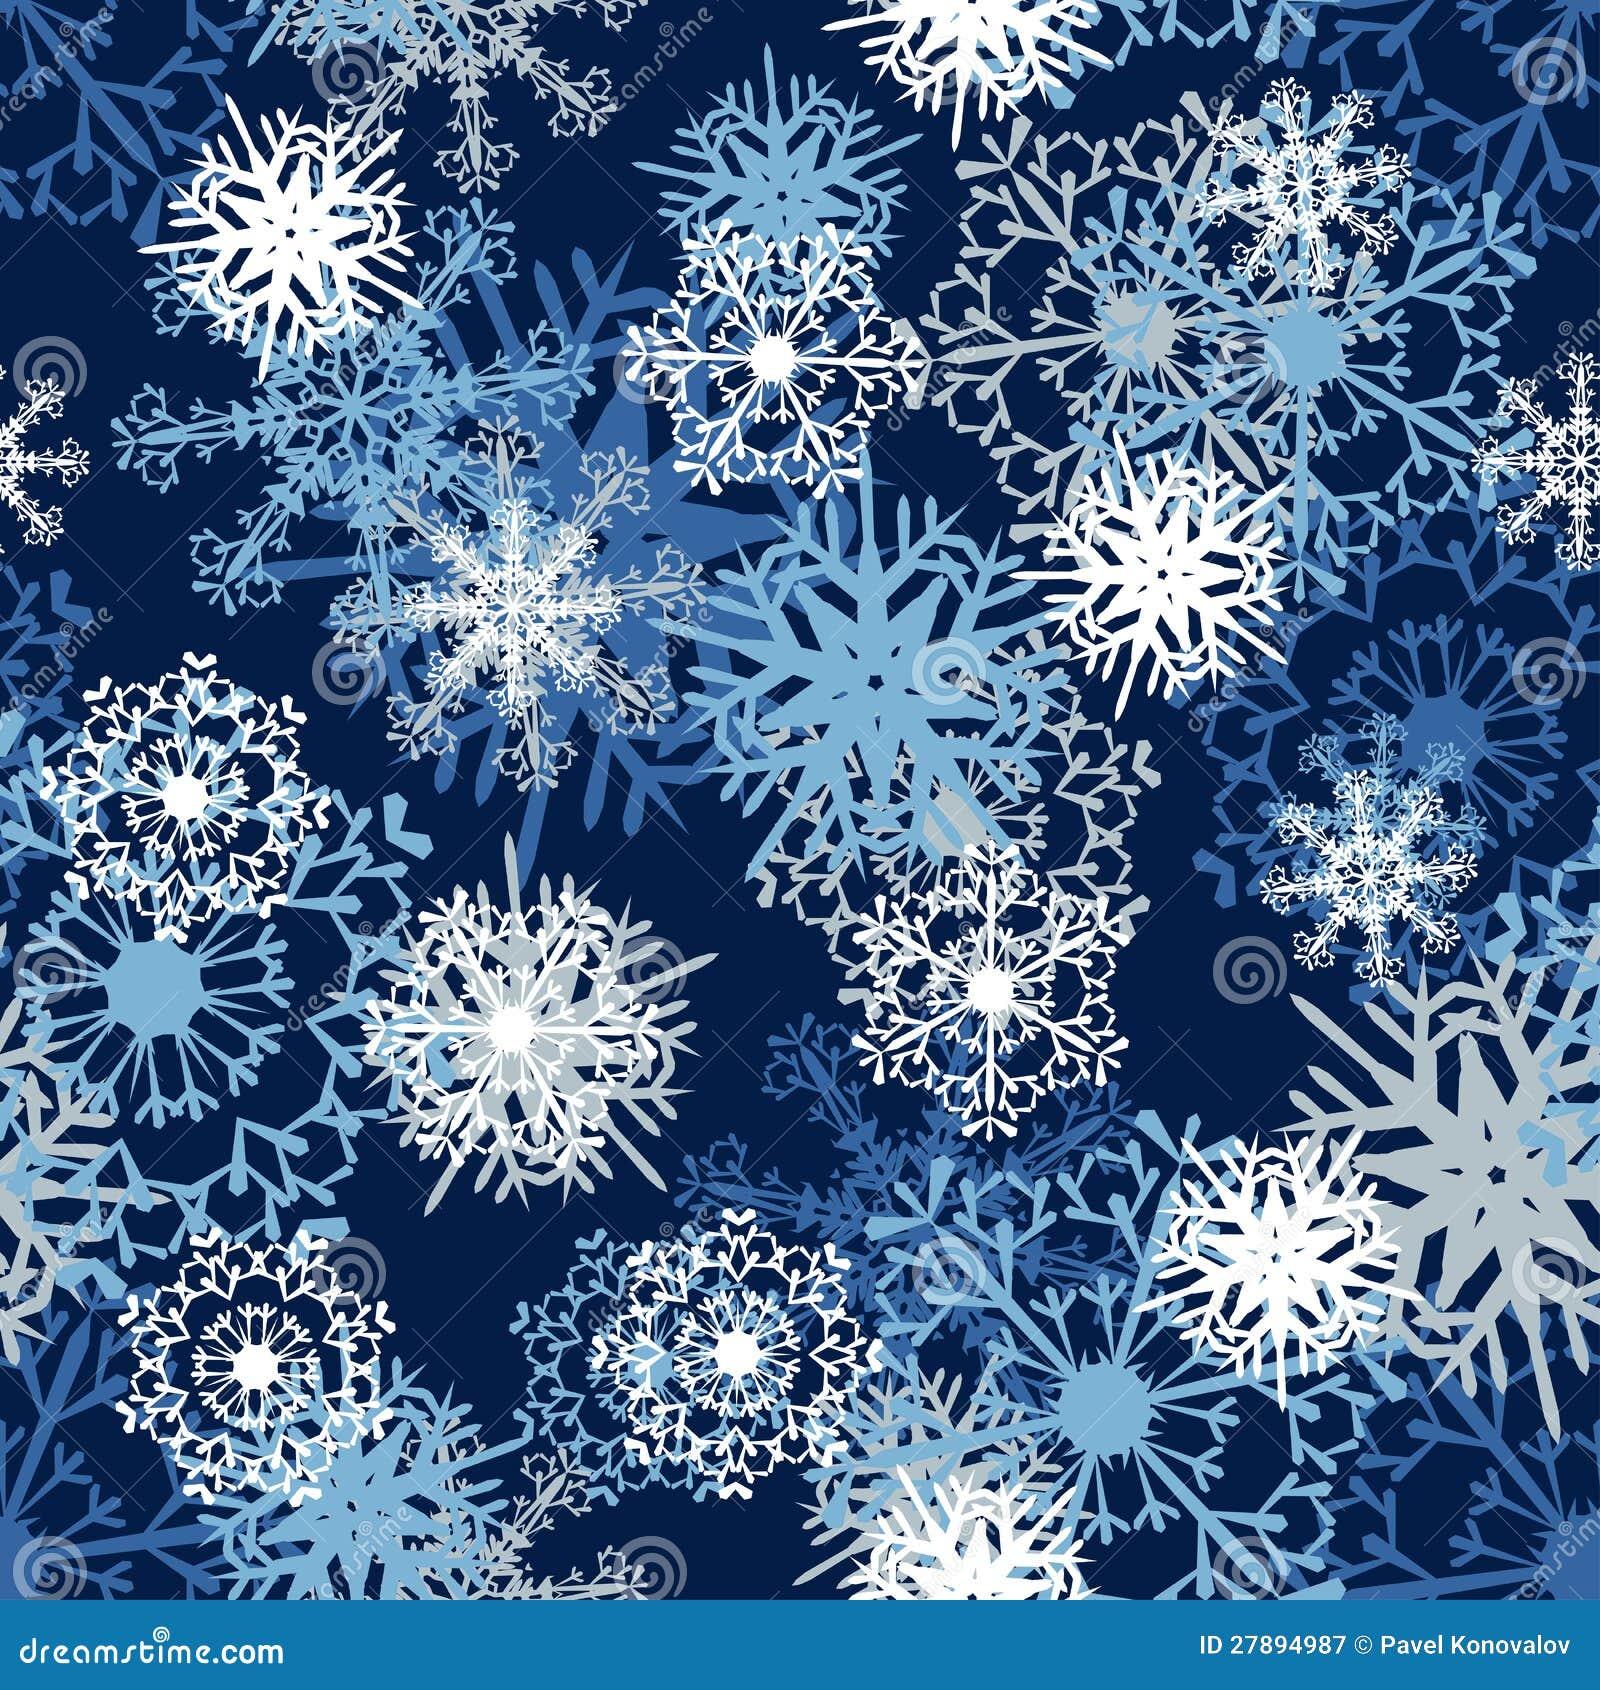 Seamless snowflake patterns. Fully editable EPS 8 vector illustration.